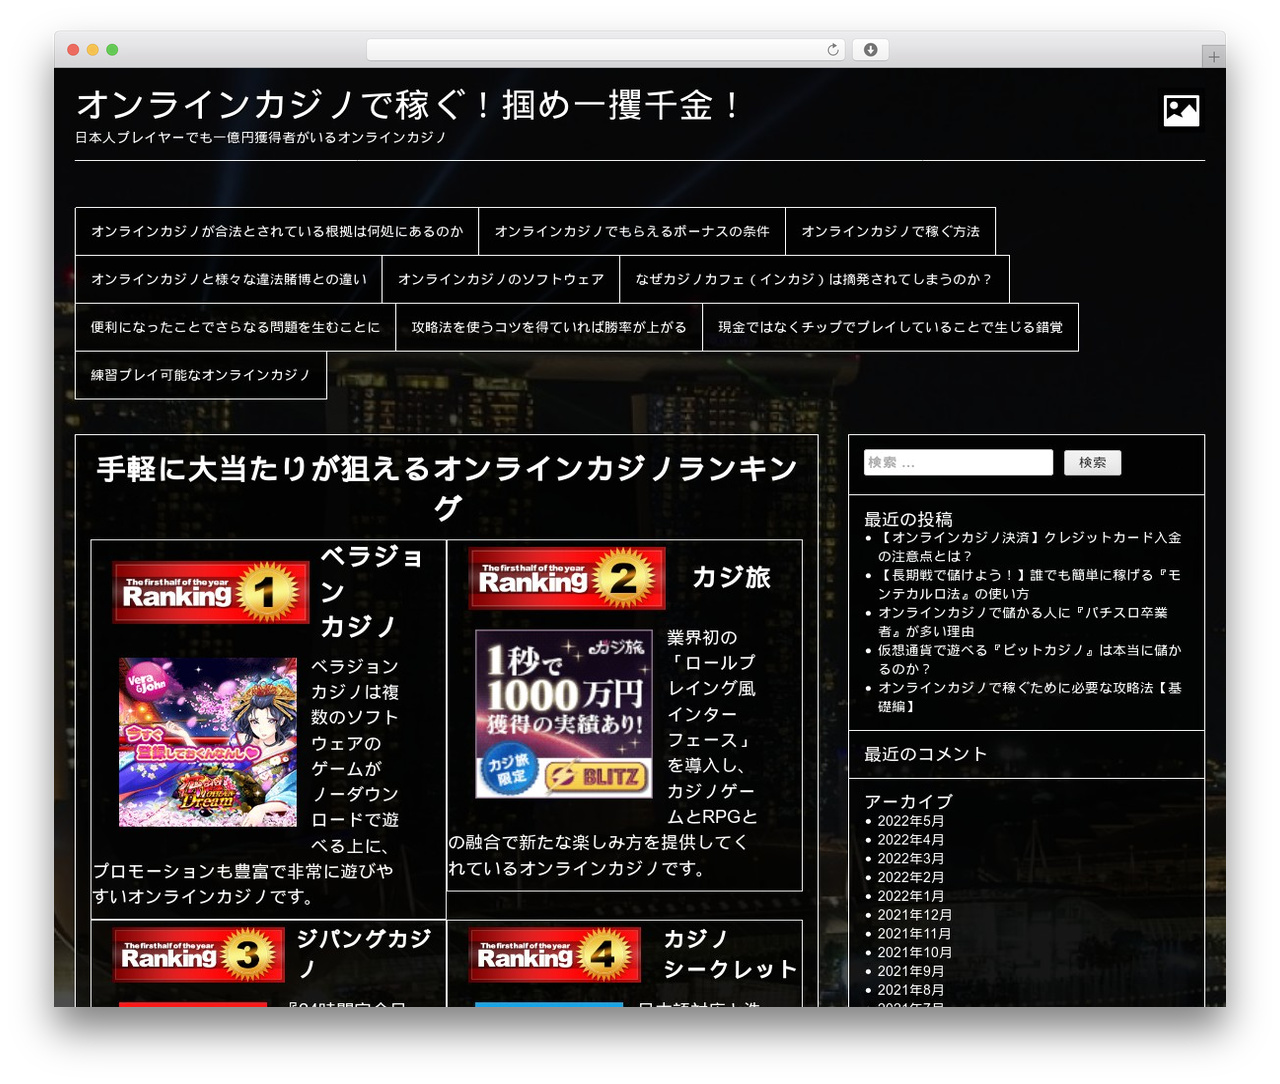 bg photo frame theme free download by takeshi kashihara